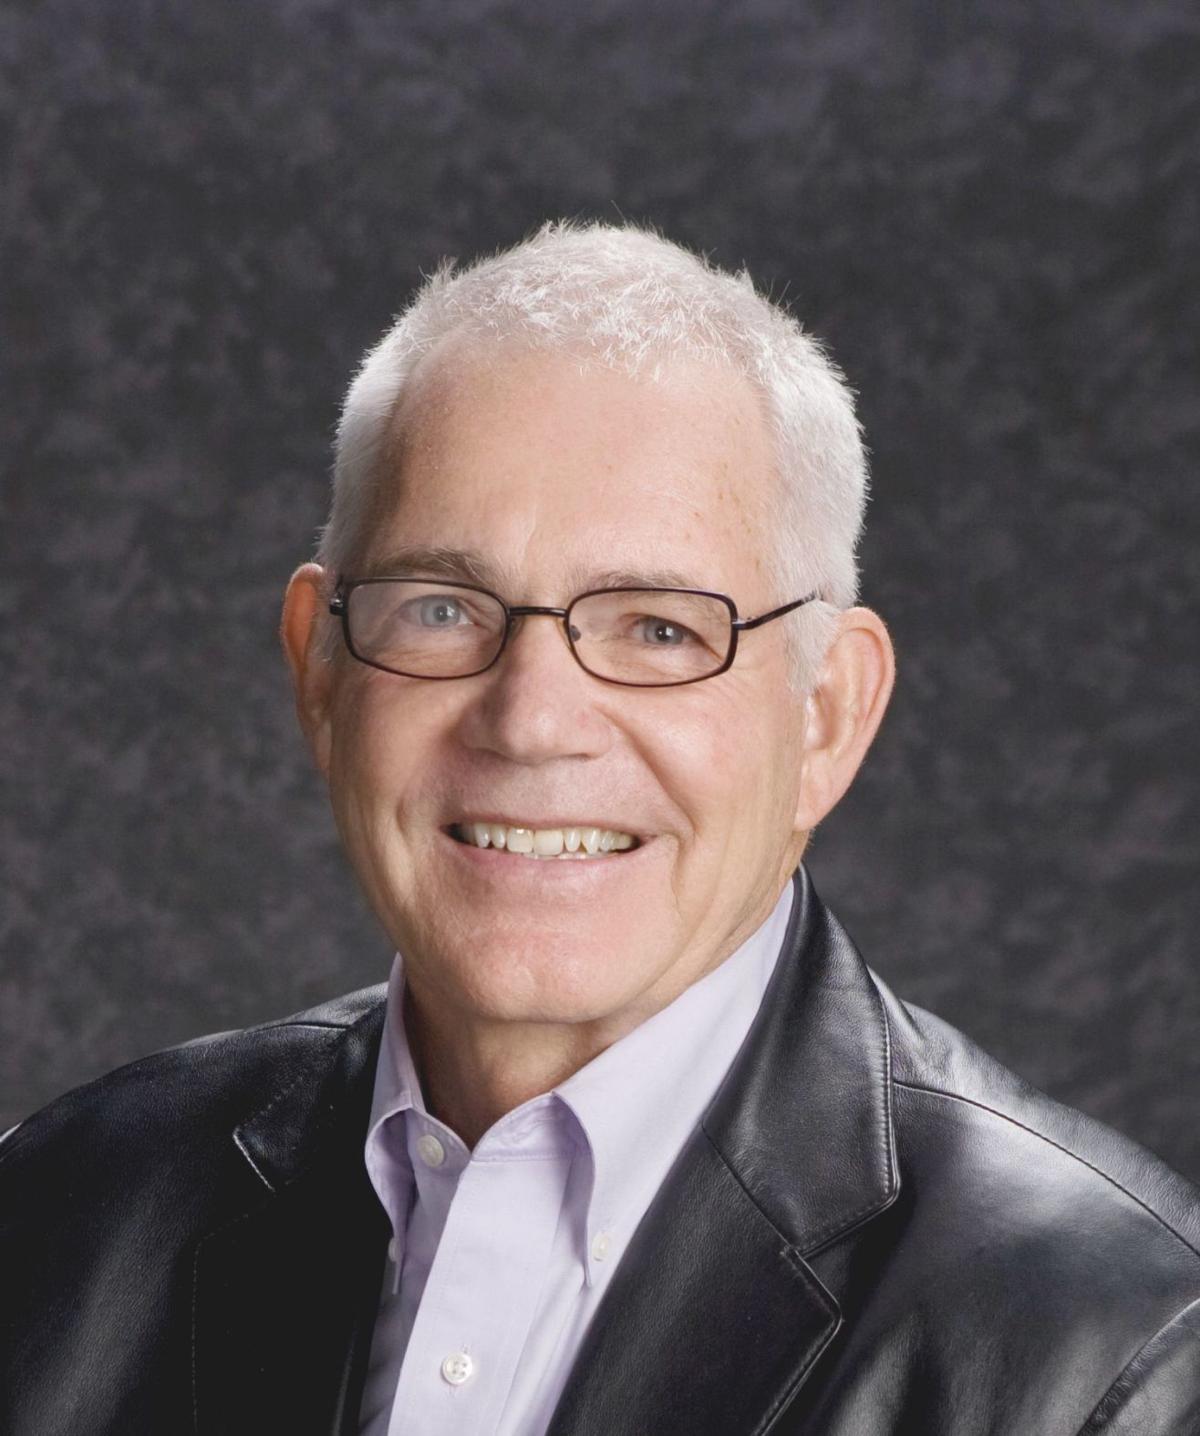 Bob Bassett